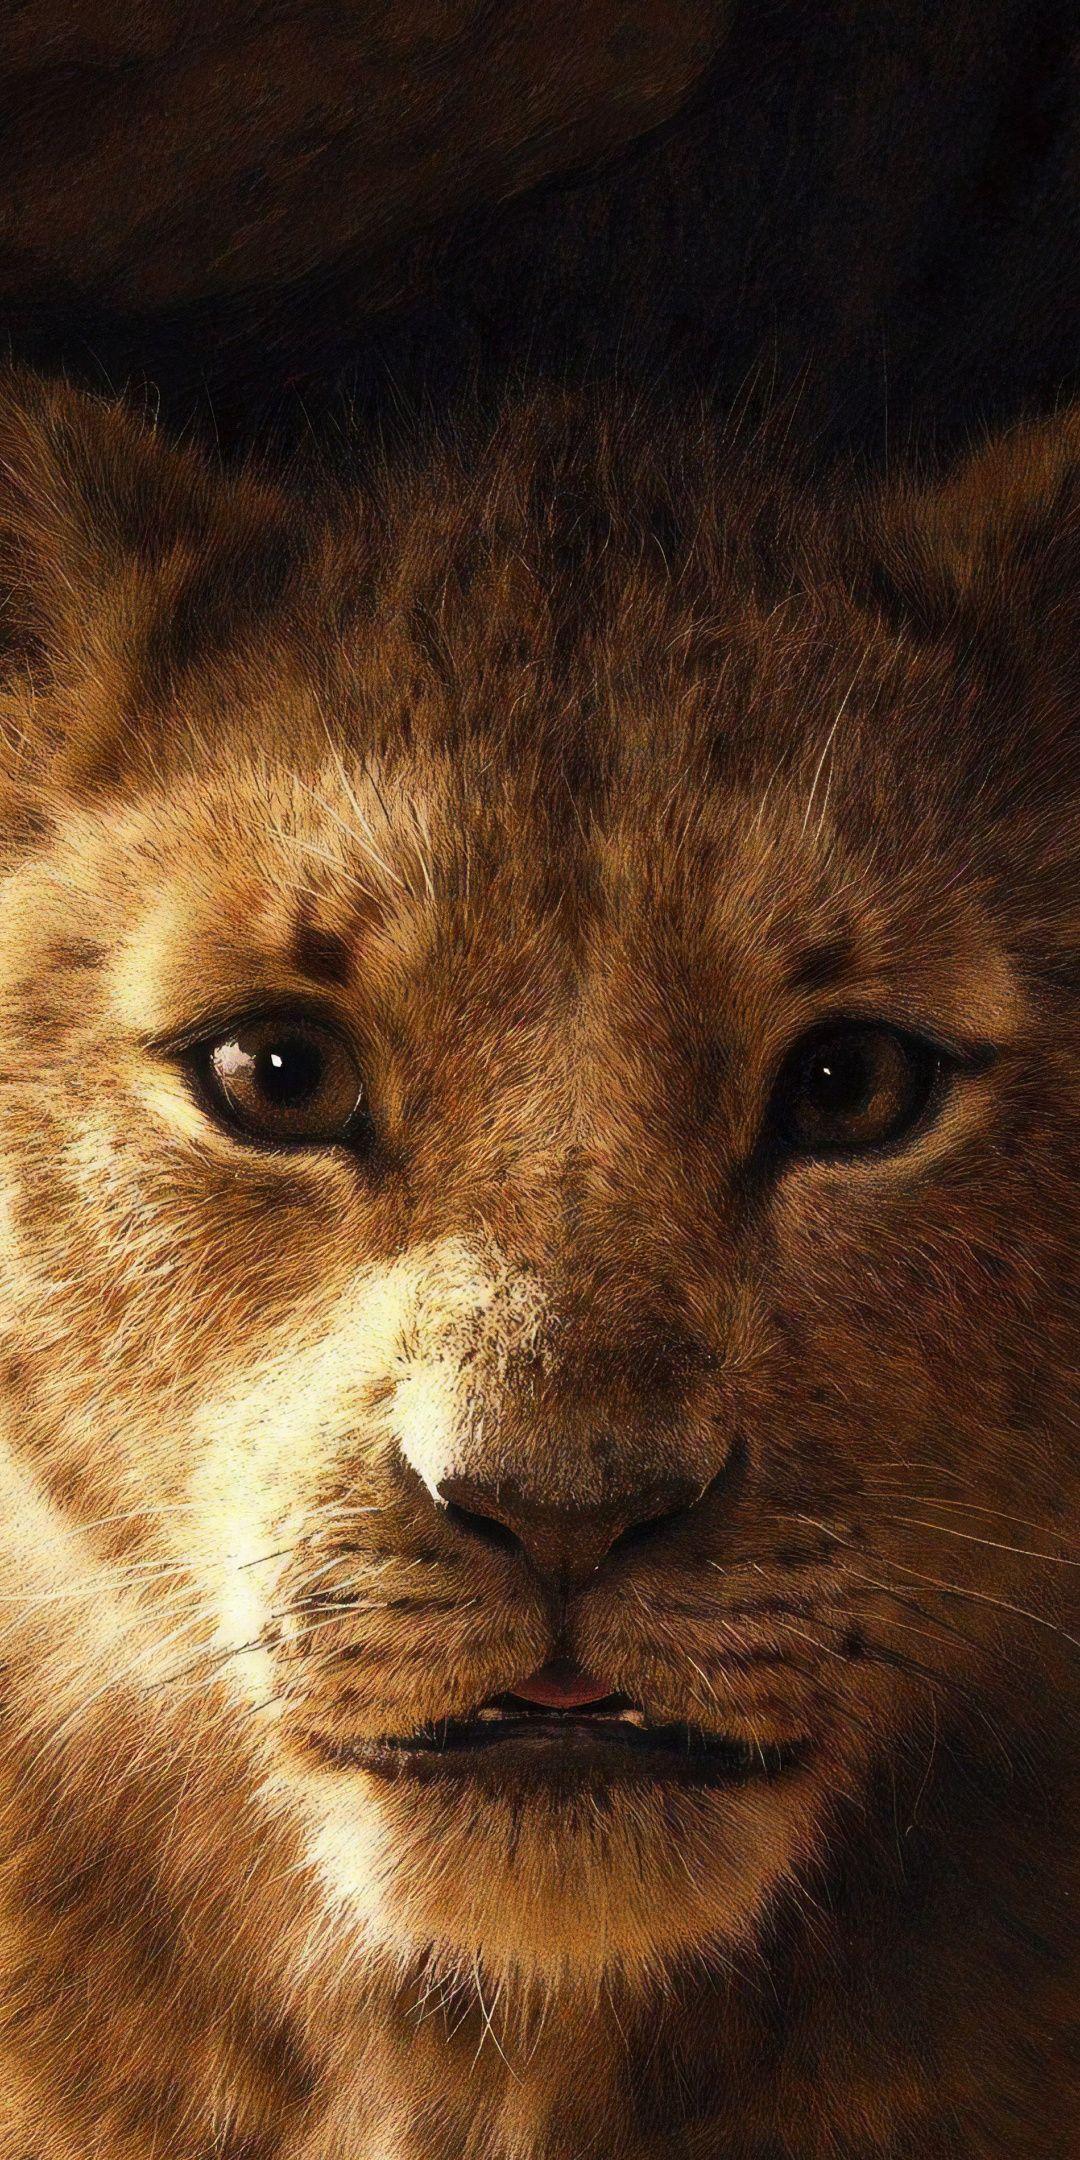 Simba The Lion King 2019 Movie 1080x2160 Wallpaper Carta Da Parati Disney Dipinti Disney Fotografia Con Animali